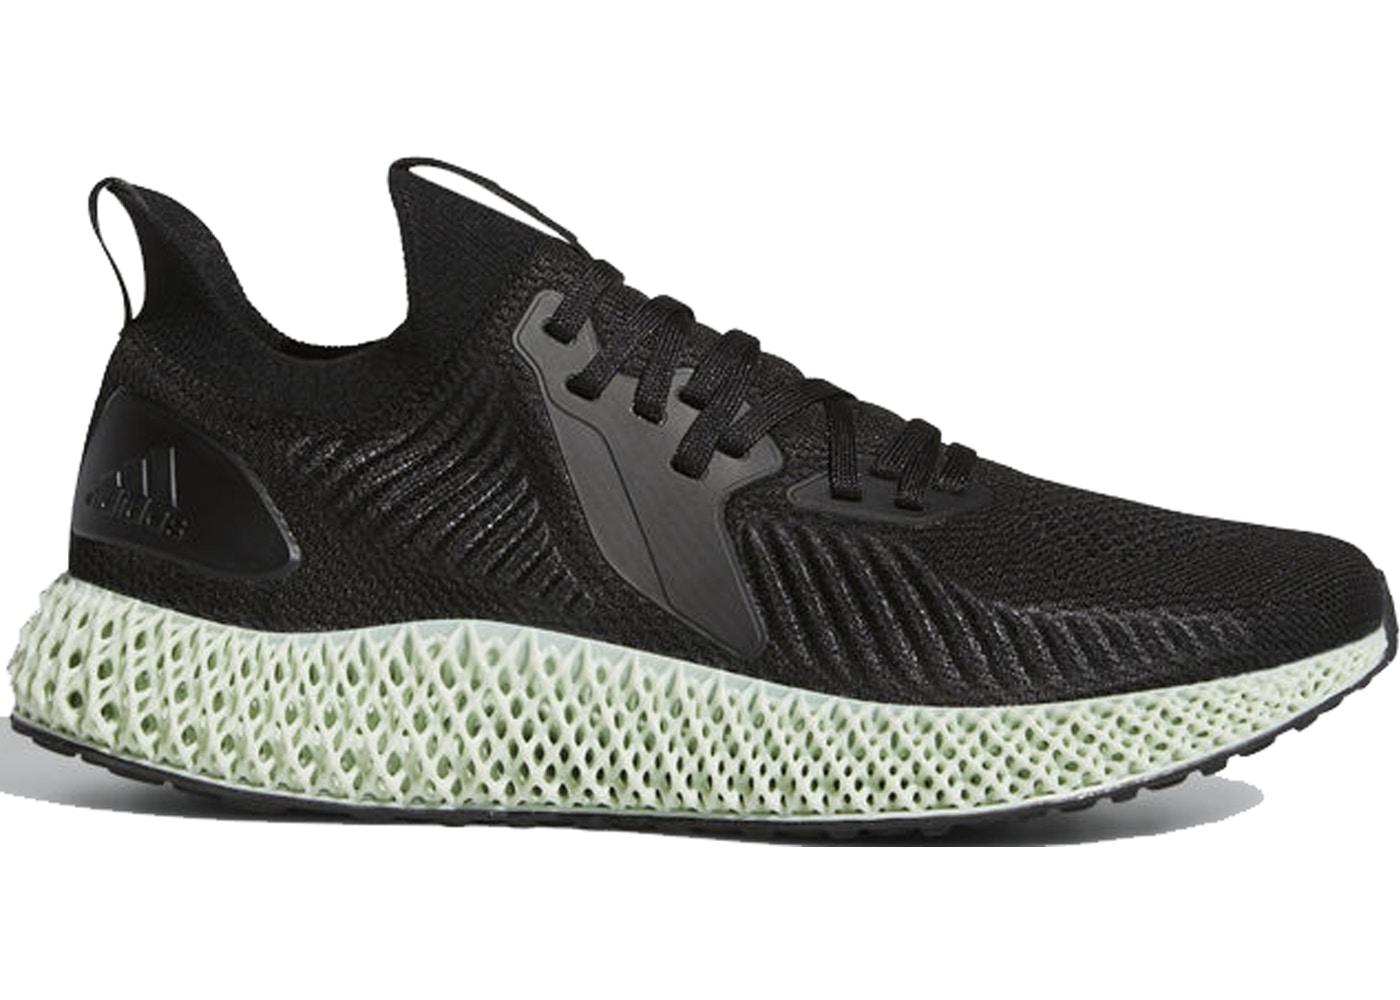 adidas alphaedge 4d for sale off 52